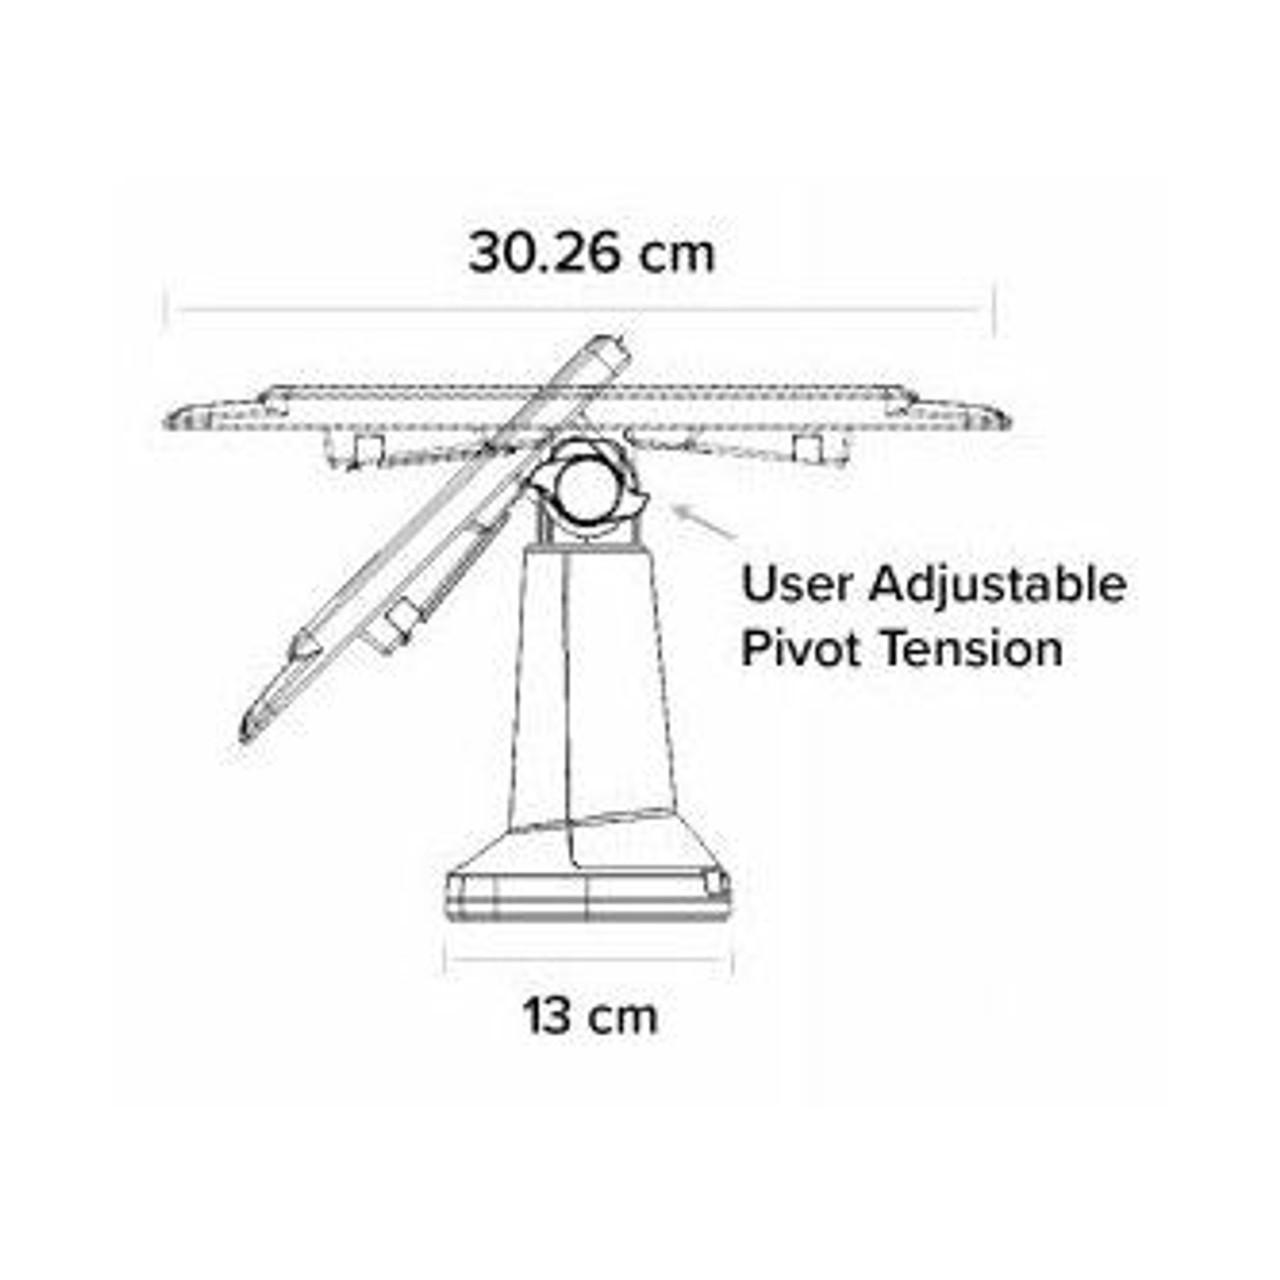 Ingenico iSC480 Tailwind FlexiPole Plus Stand